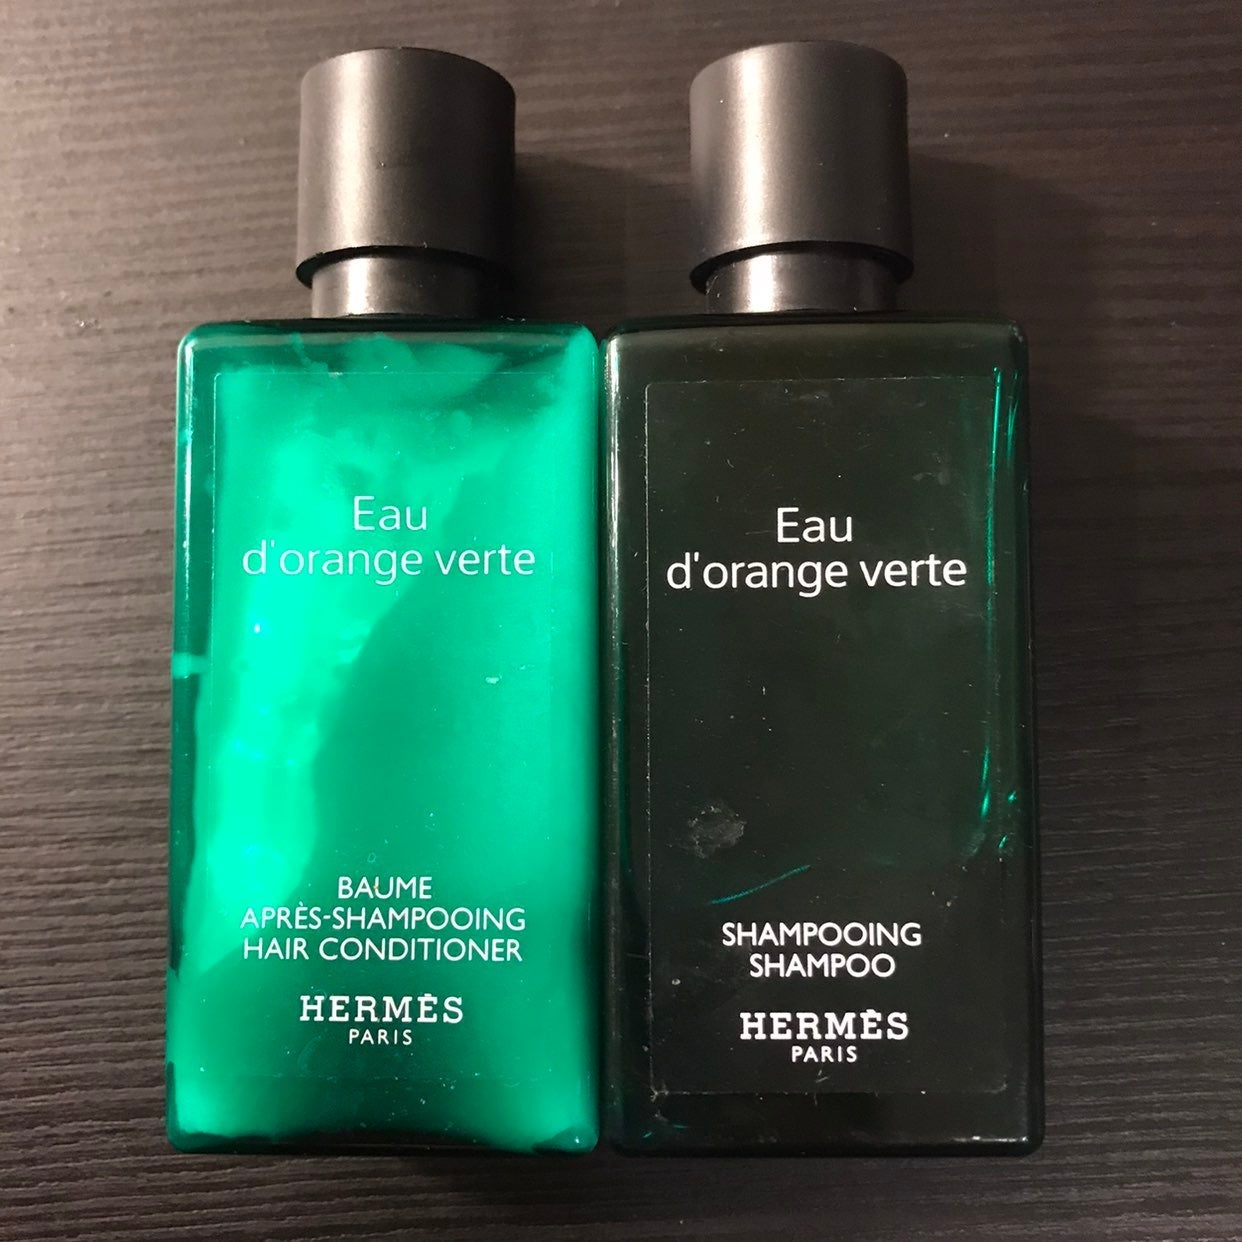 Hermes shampoo and conditioner set